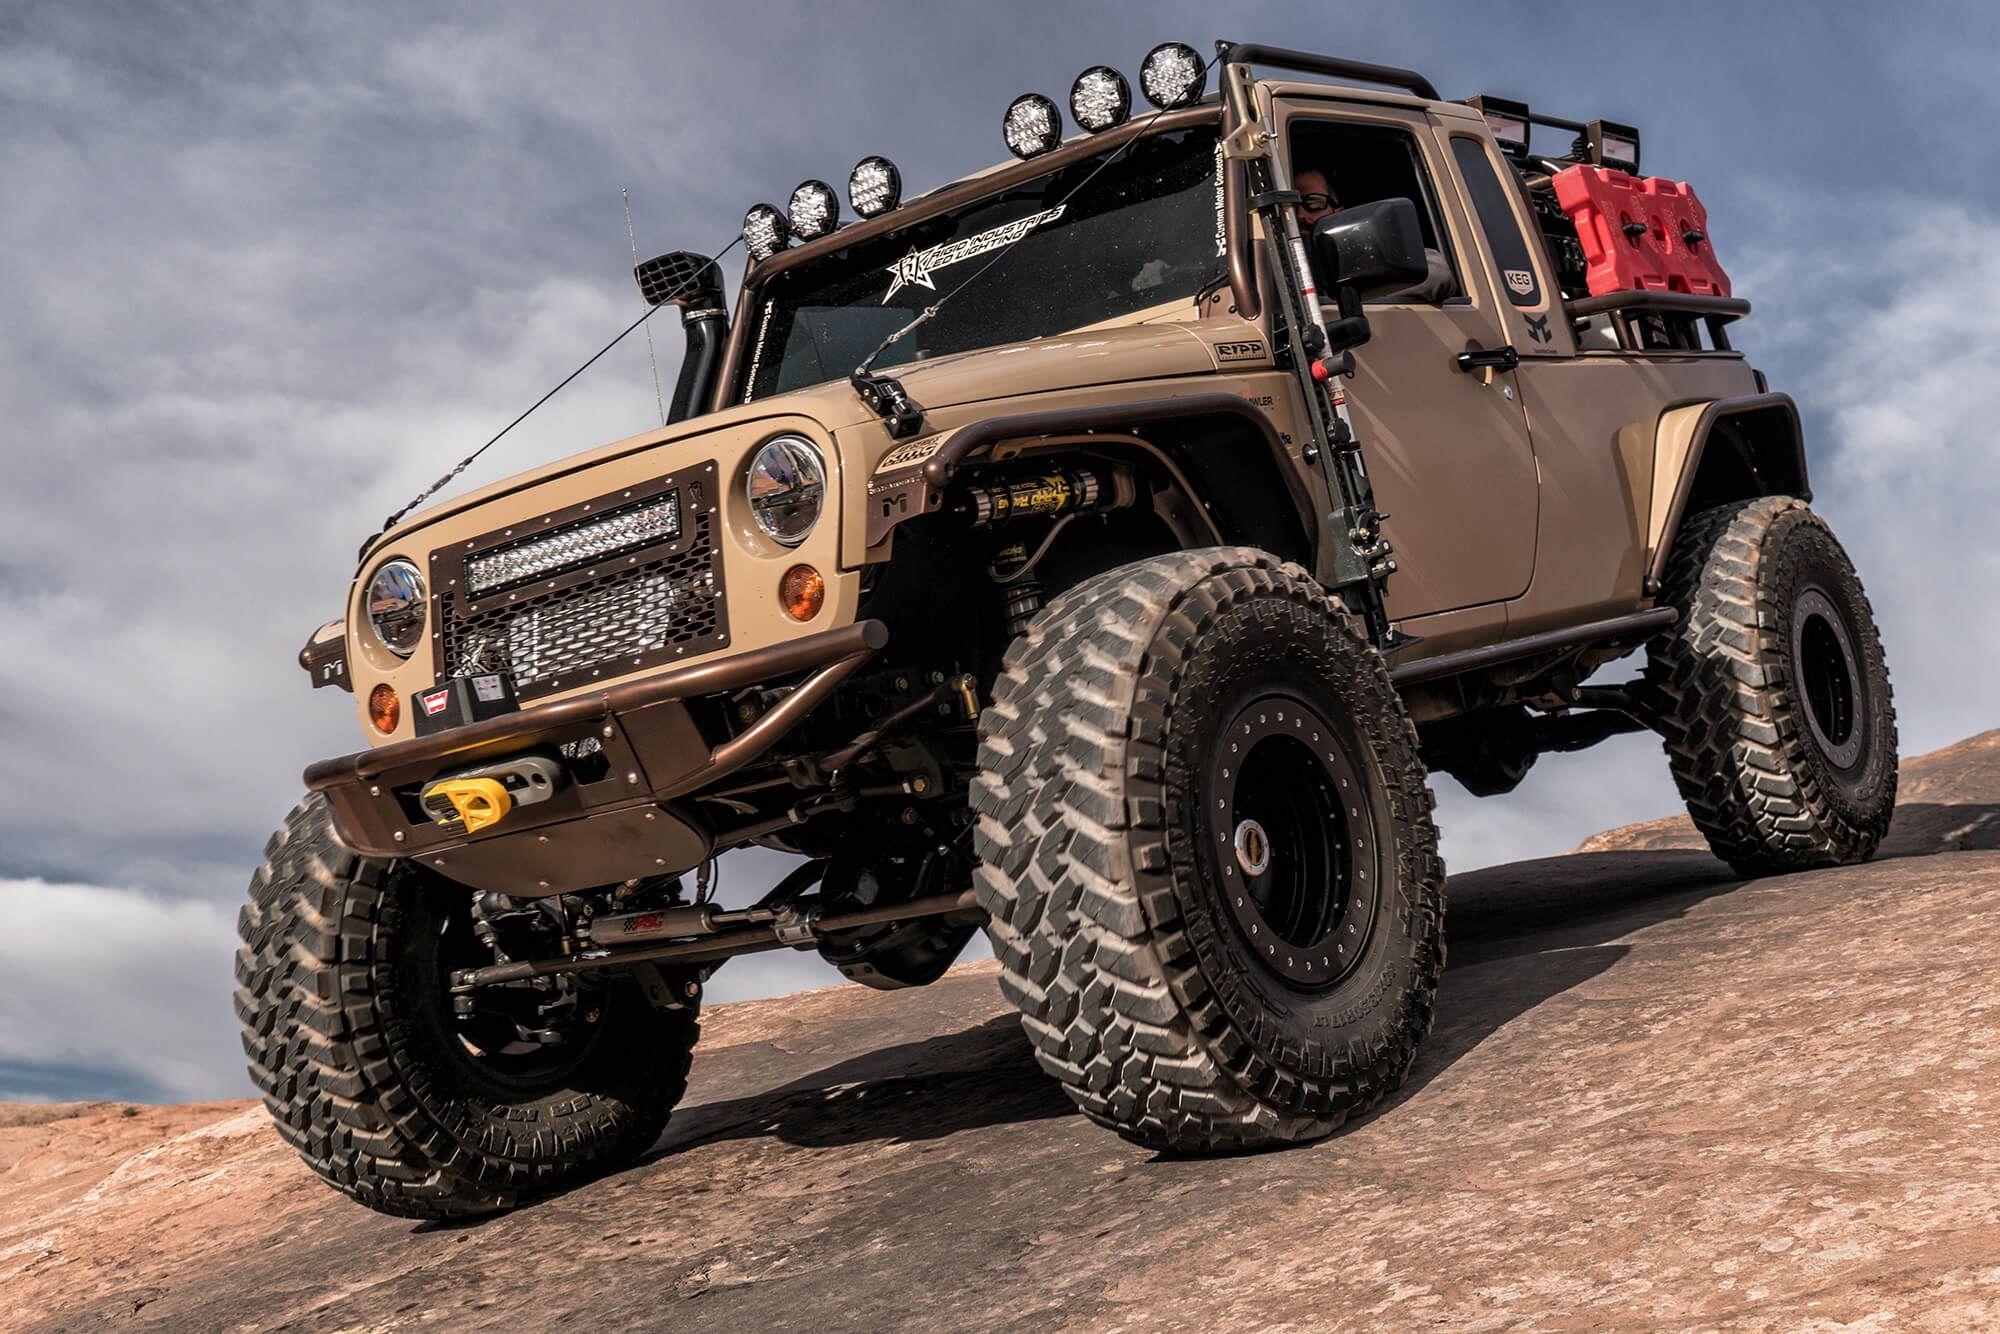 2007 2018 Jeep Jk Venom Winch Front Bumper Addictive Desert